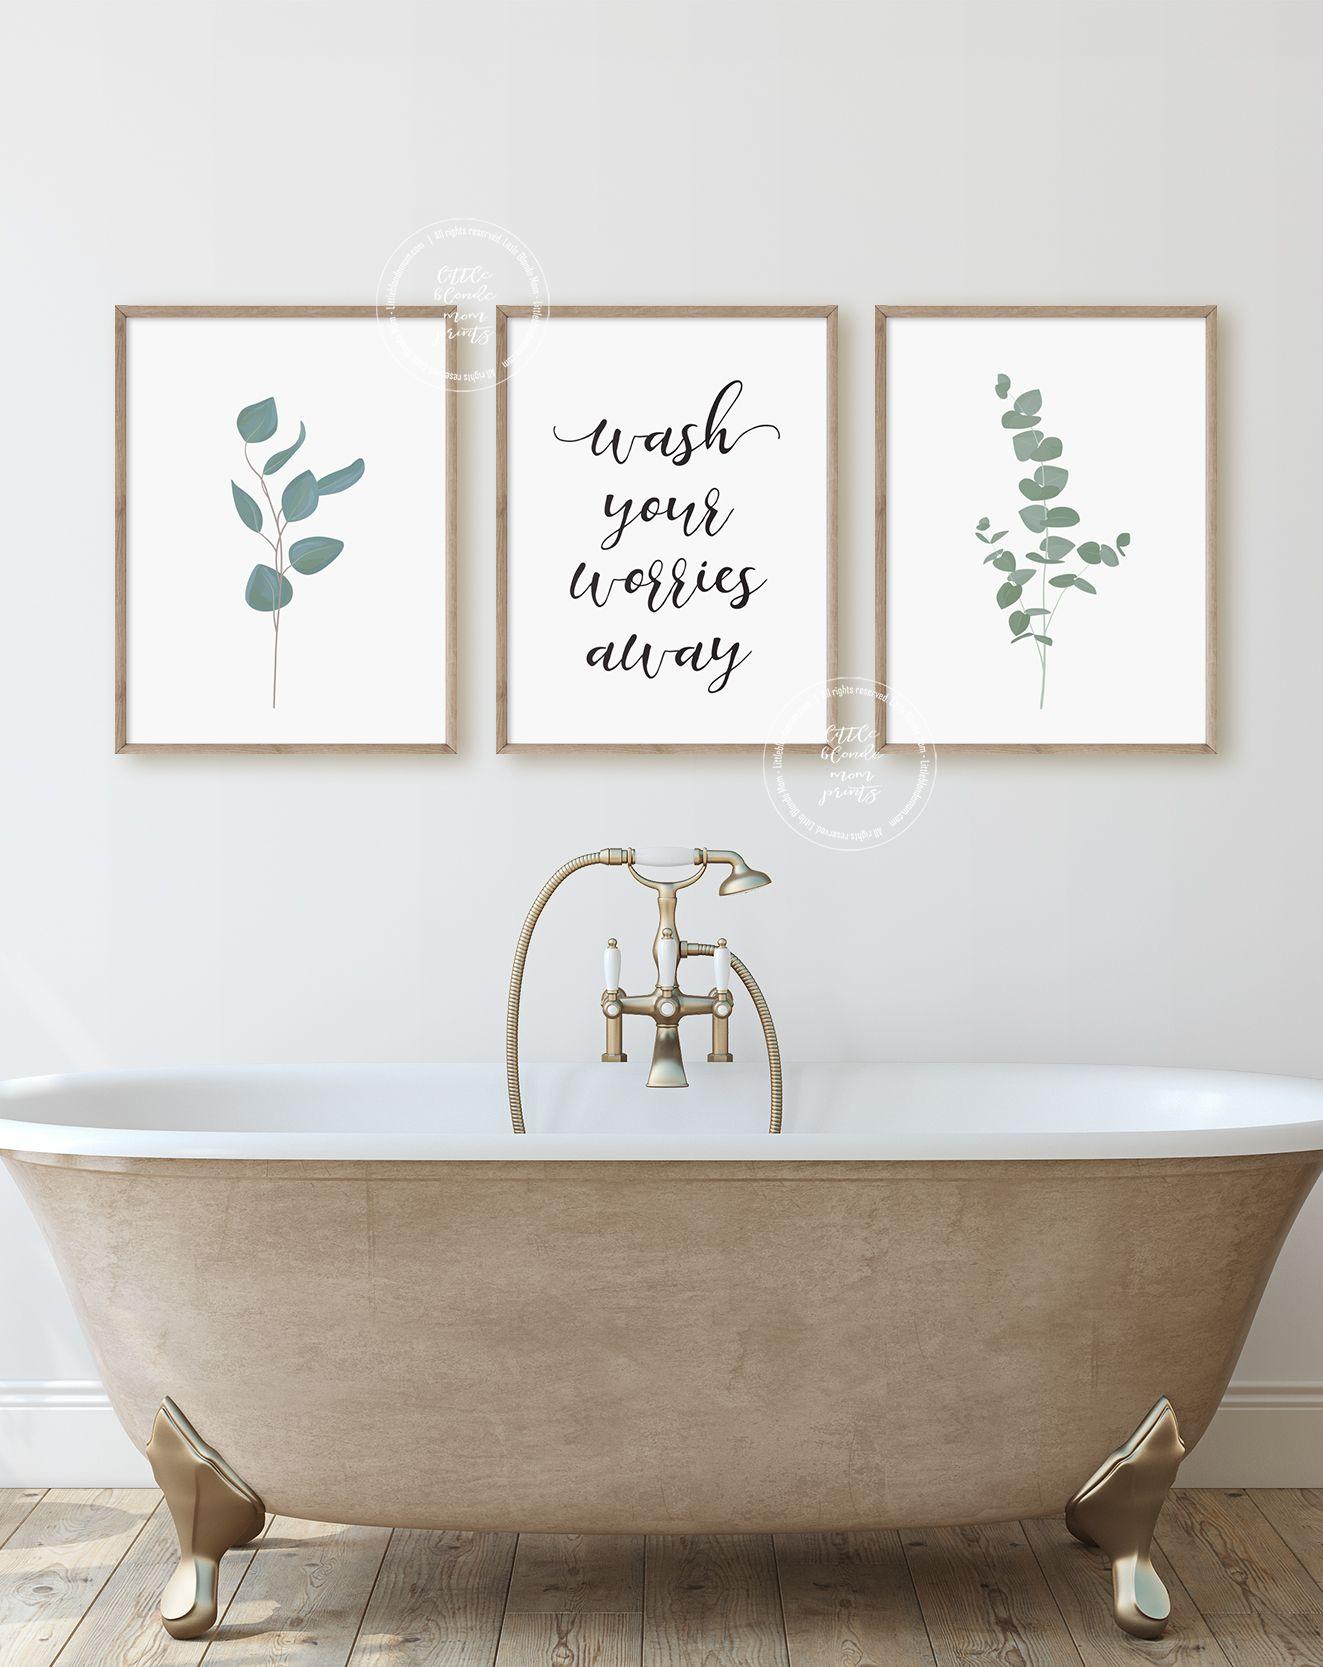 Bathroom Wall Decor Poster Prints Set Of 3 Wall Art Etsy In 2020 Bathroom Wall Mural Bathroom Wall Decor Farmhouse Wall Art